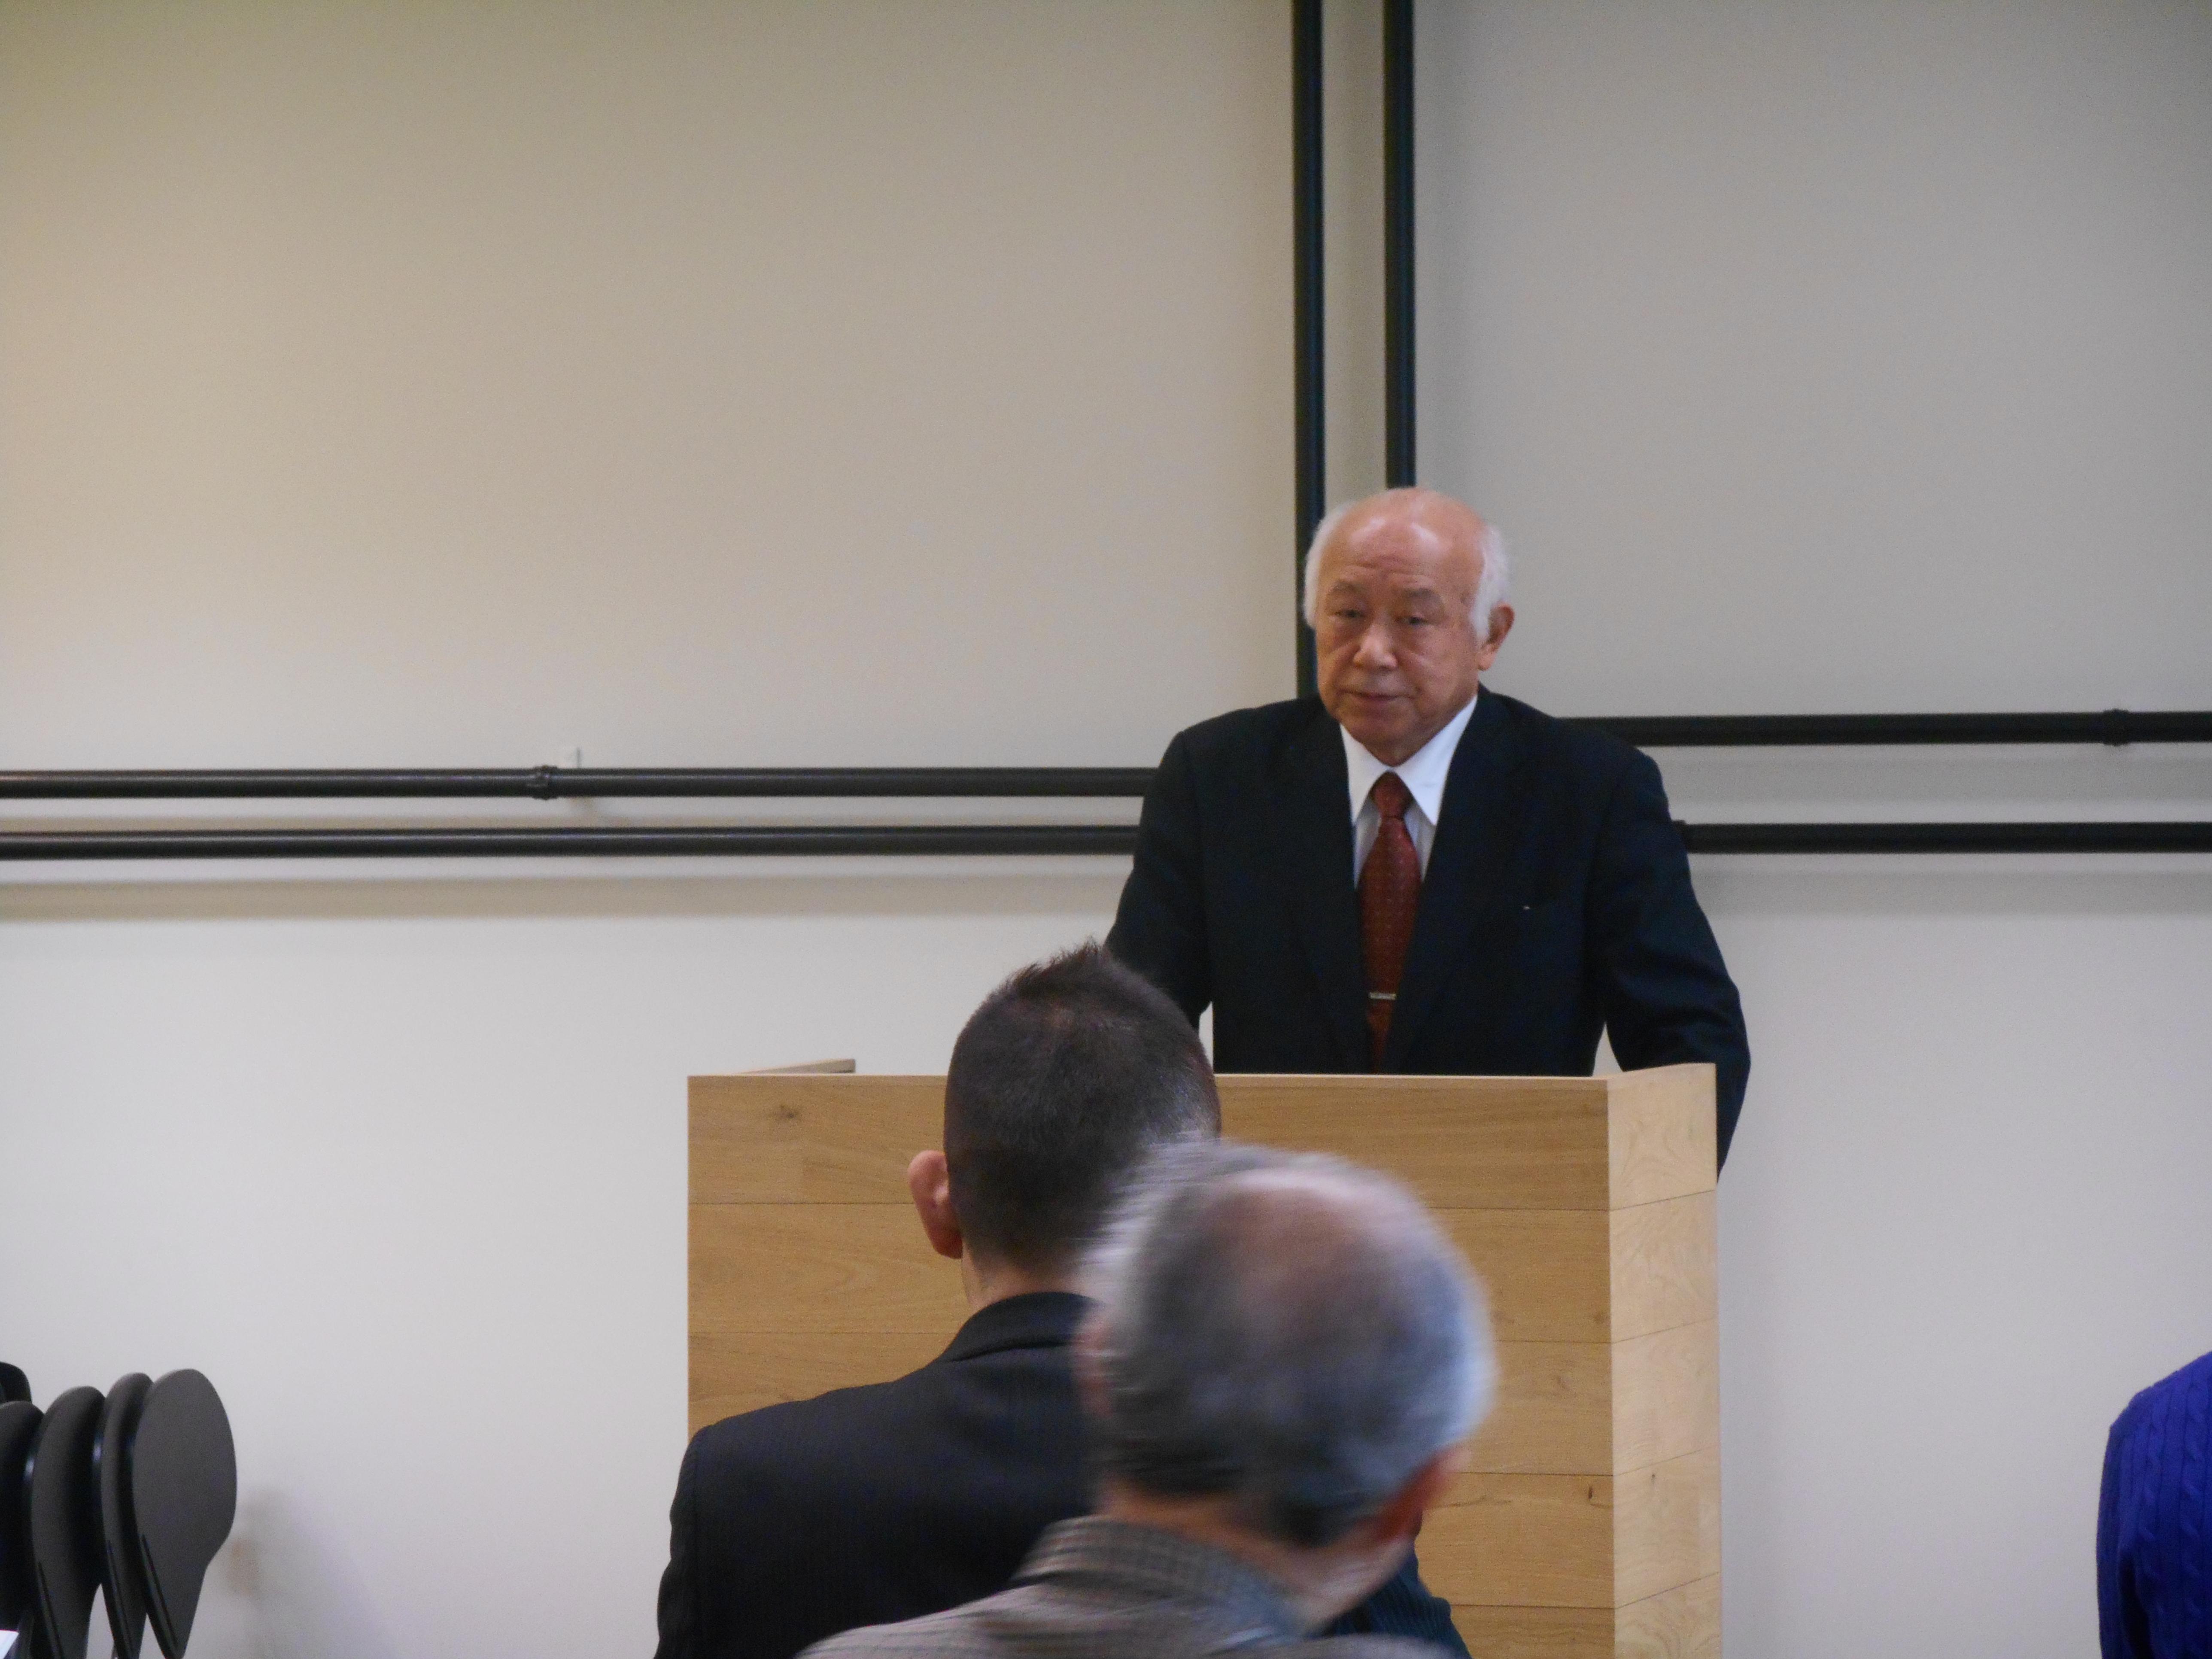 DSCN3706 1 - 4月1日東京思風塾の開催になります。